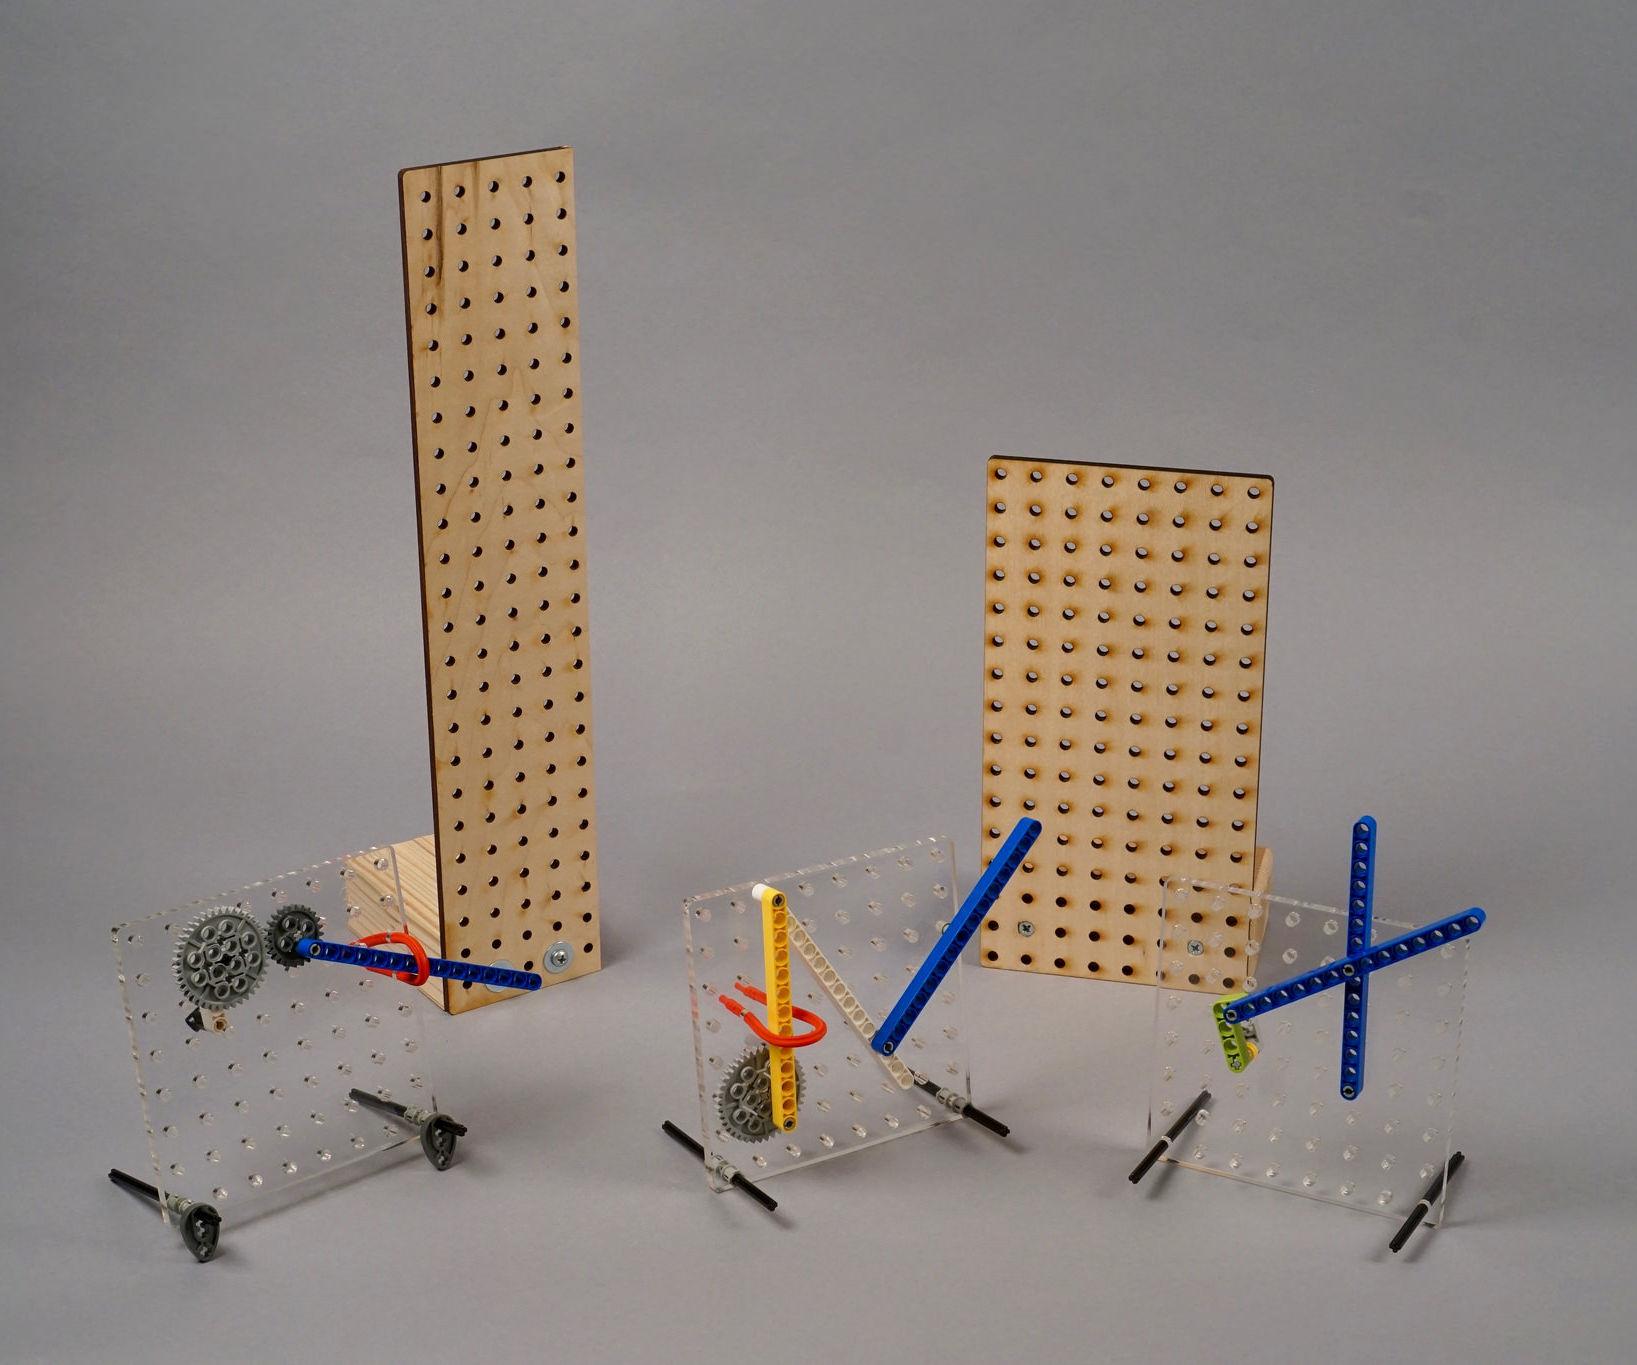 LEGO Tinkering Pegboard